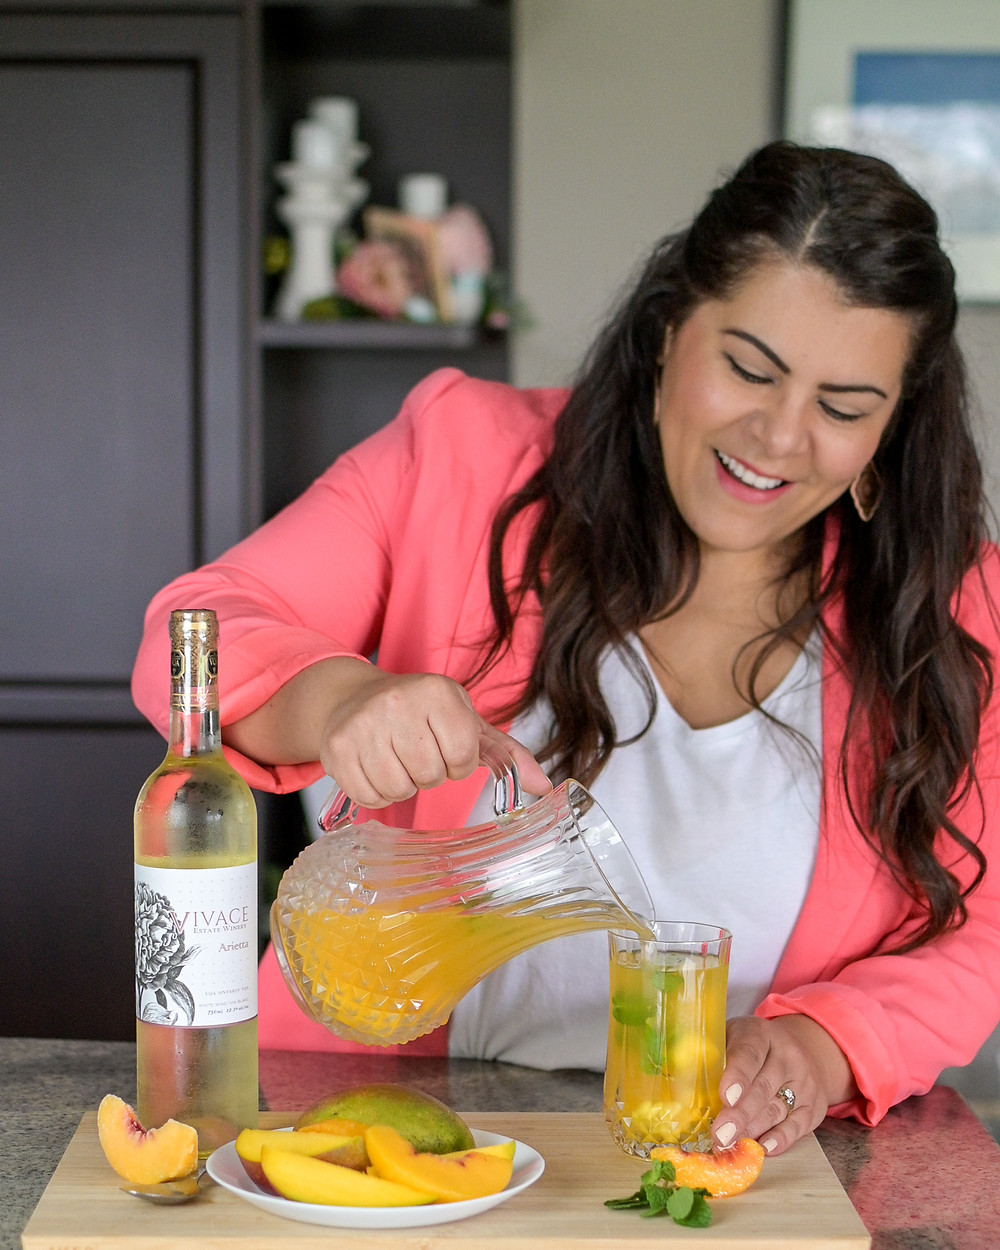 Mara from Joyful Hostest pouring the Vivace Peach Mango Sangria into a glass